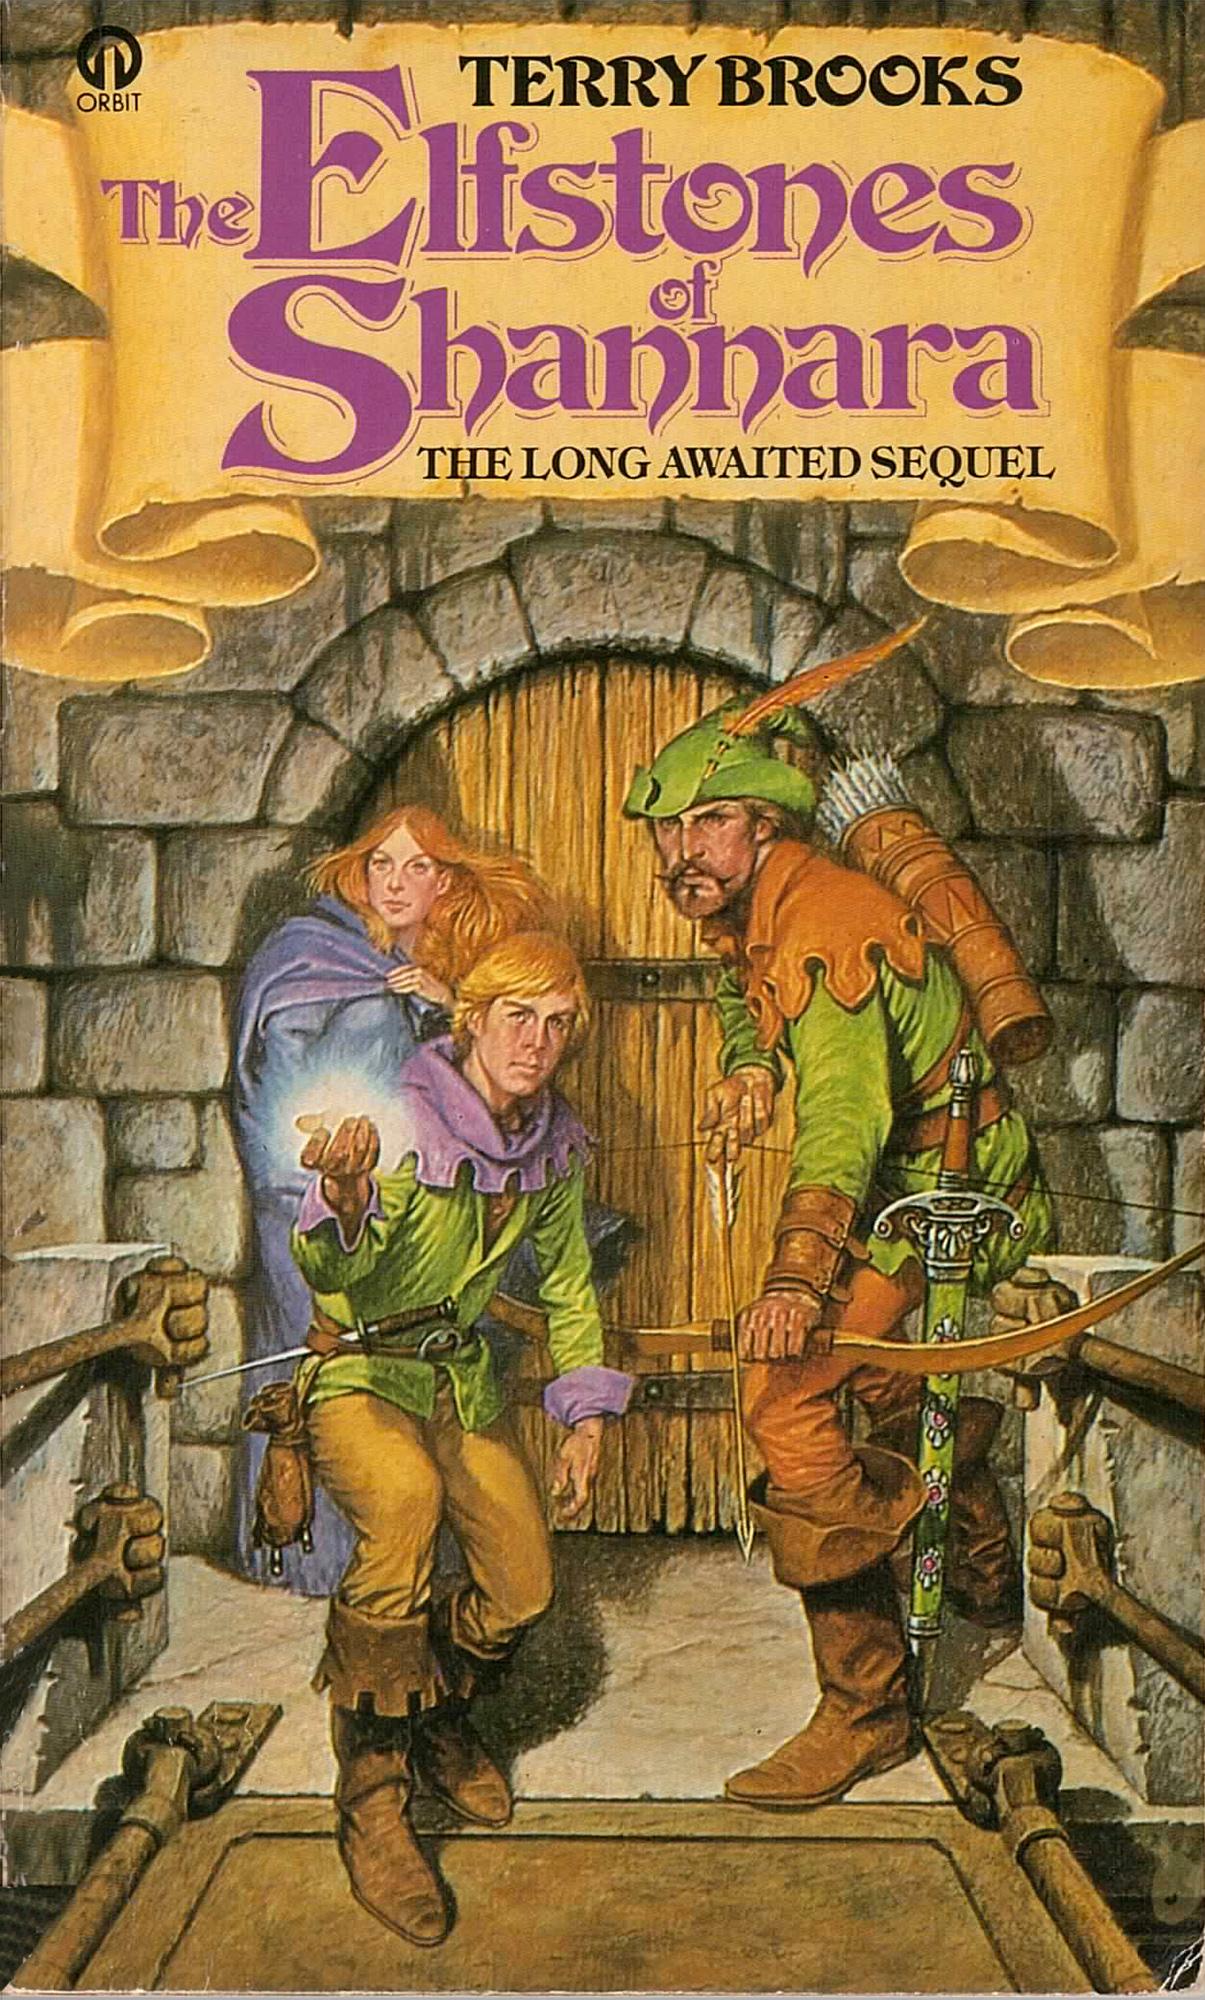 The Elf Queen of Shannara (Heritage of Shannara, Book 3)